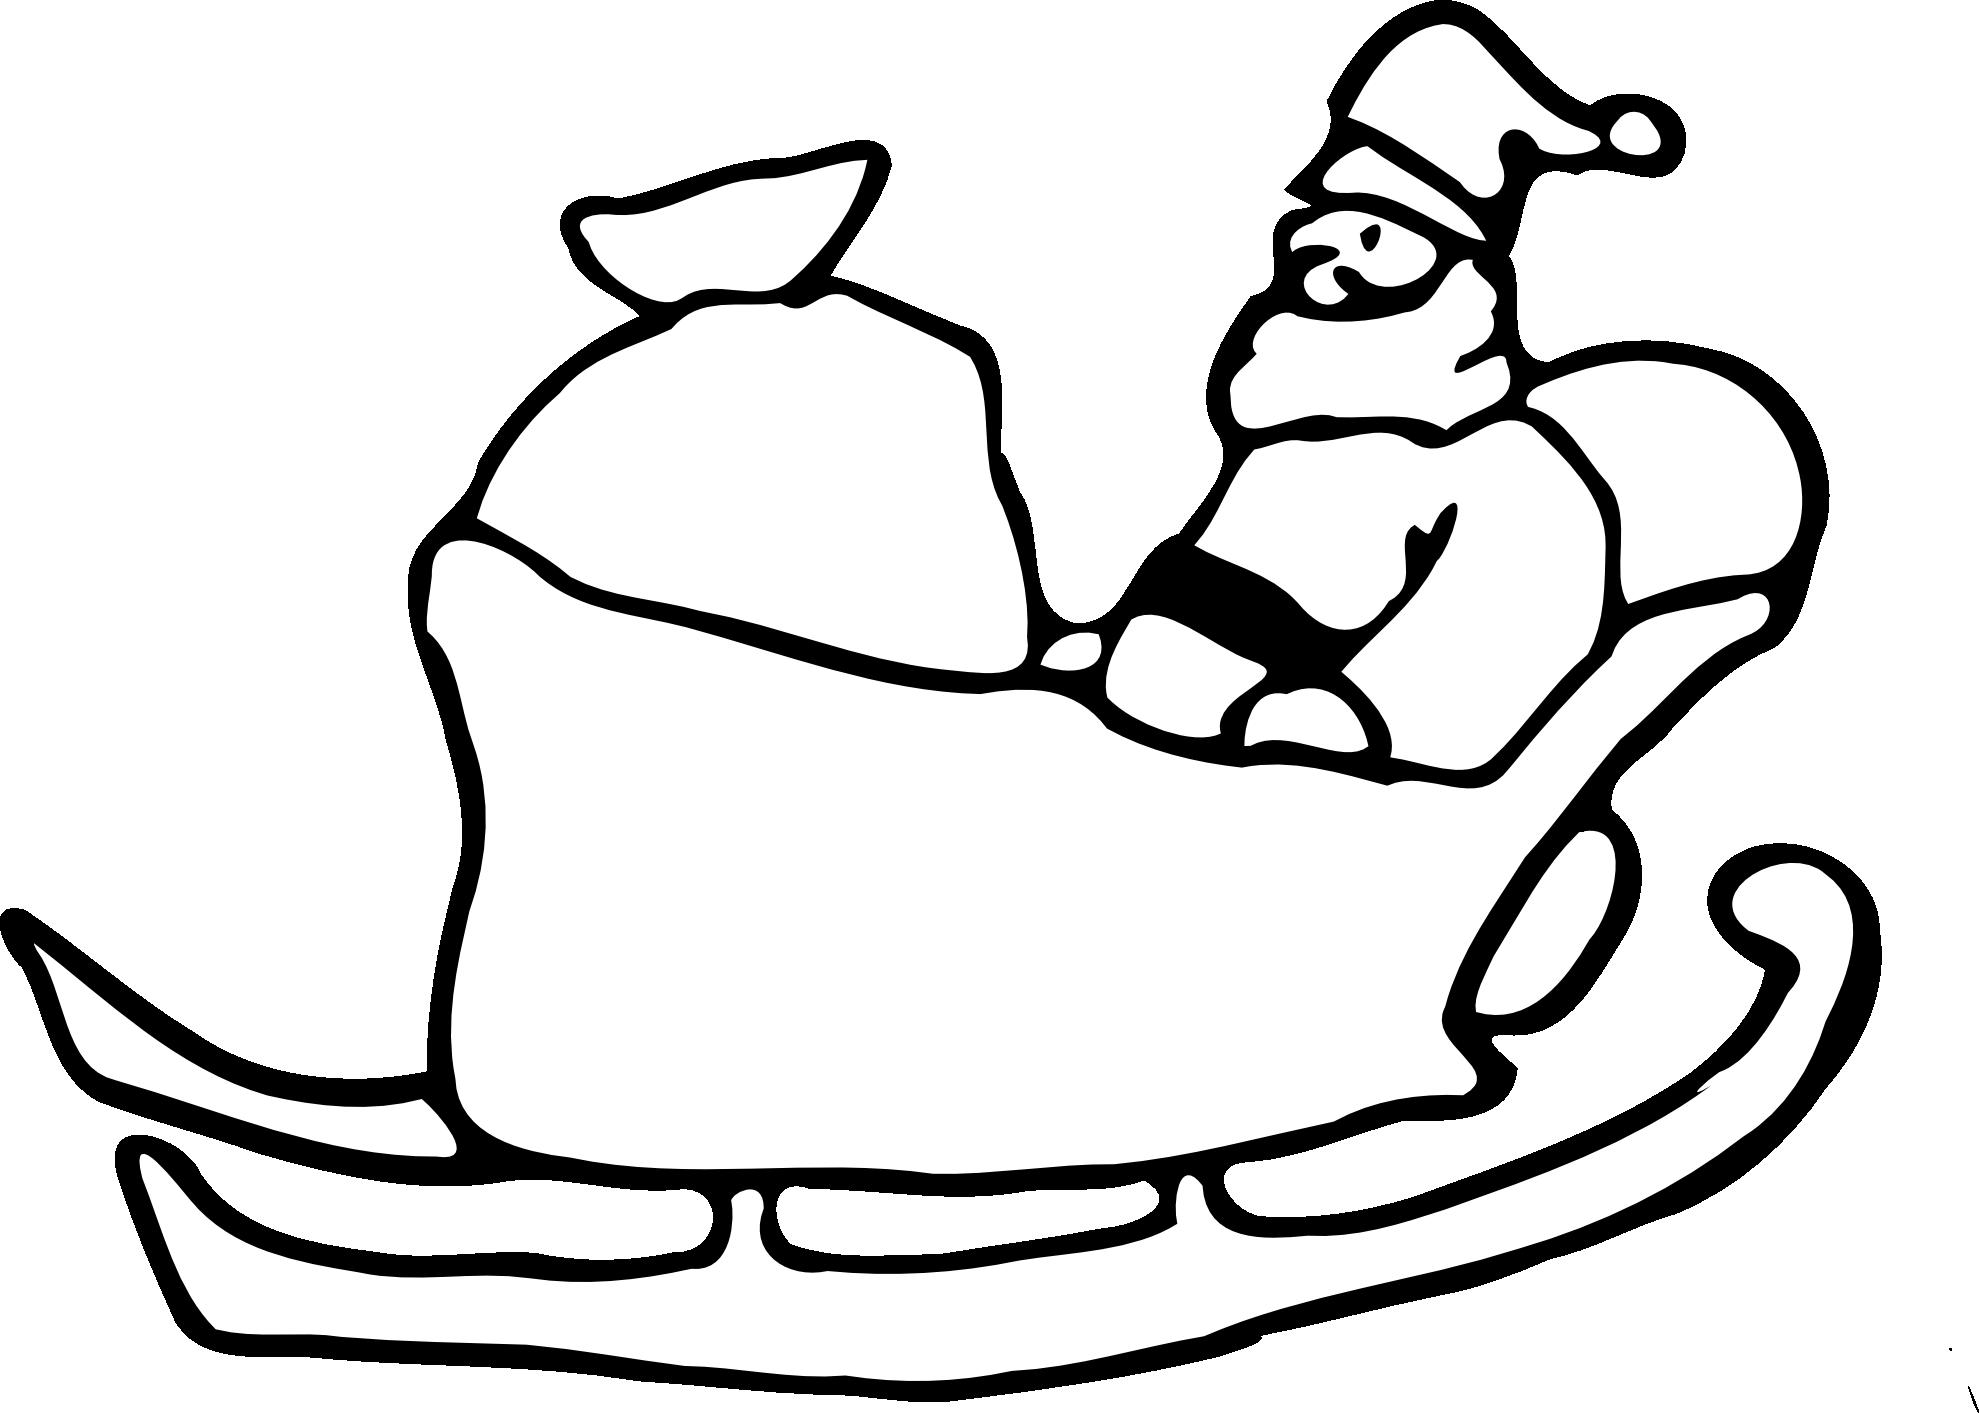 clipart black and white library Santa Sled Drawing at GetDrawings